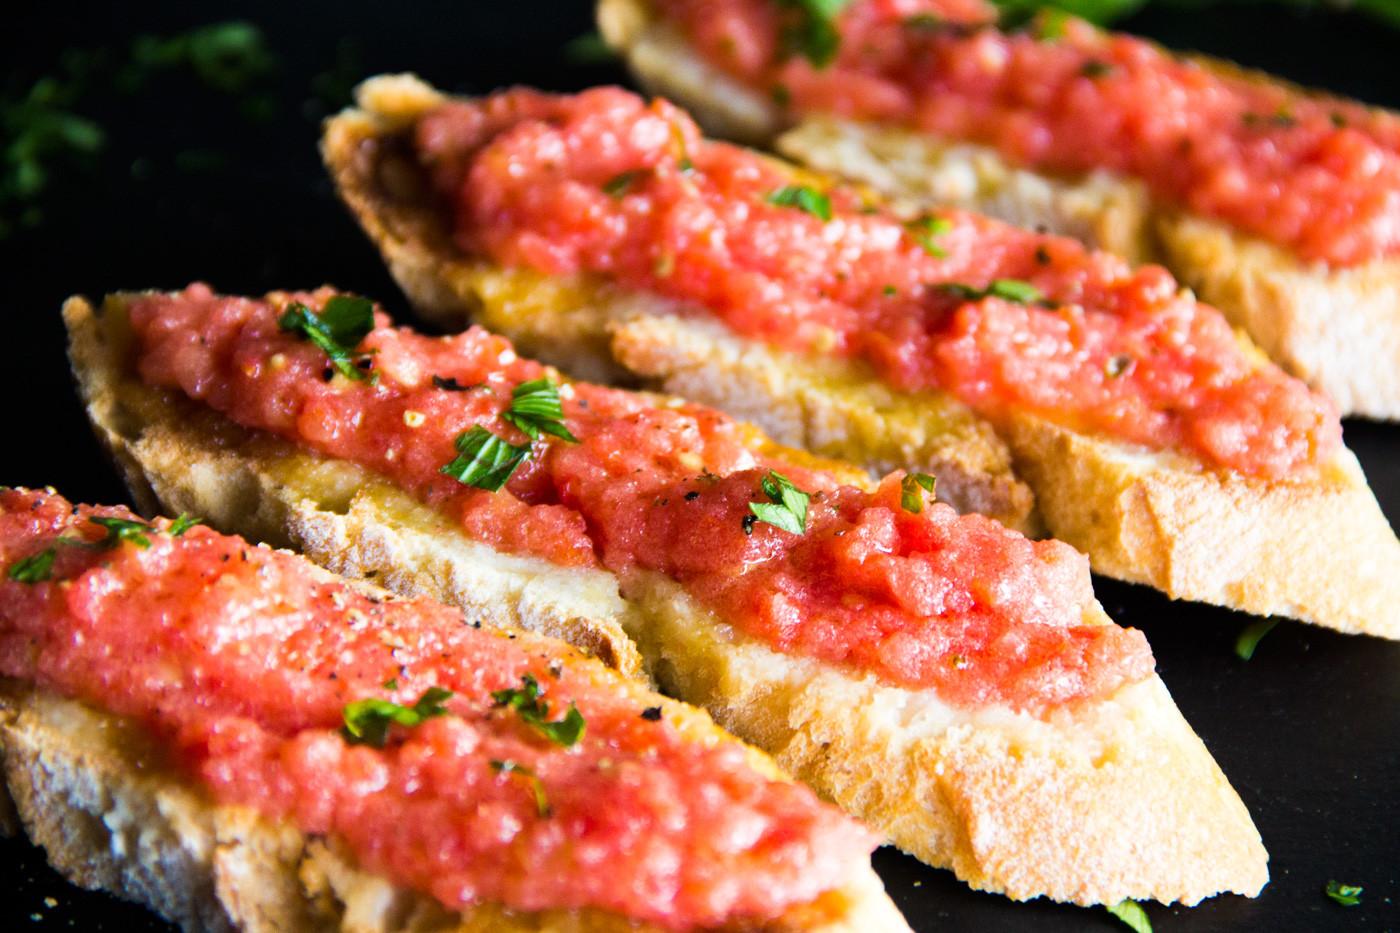 Cocina española #2: Pan con Tomate   Recetas Erasmus